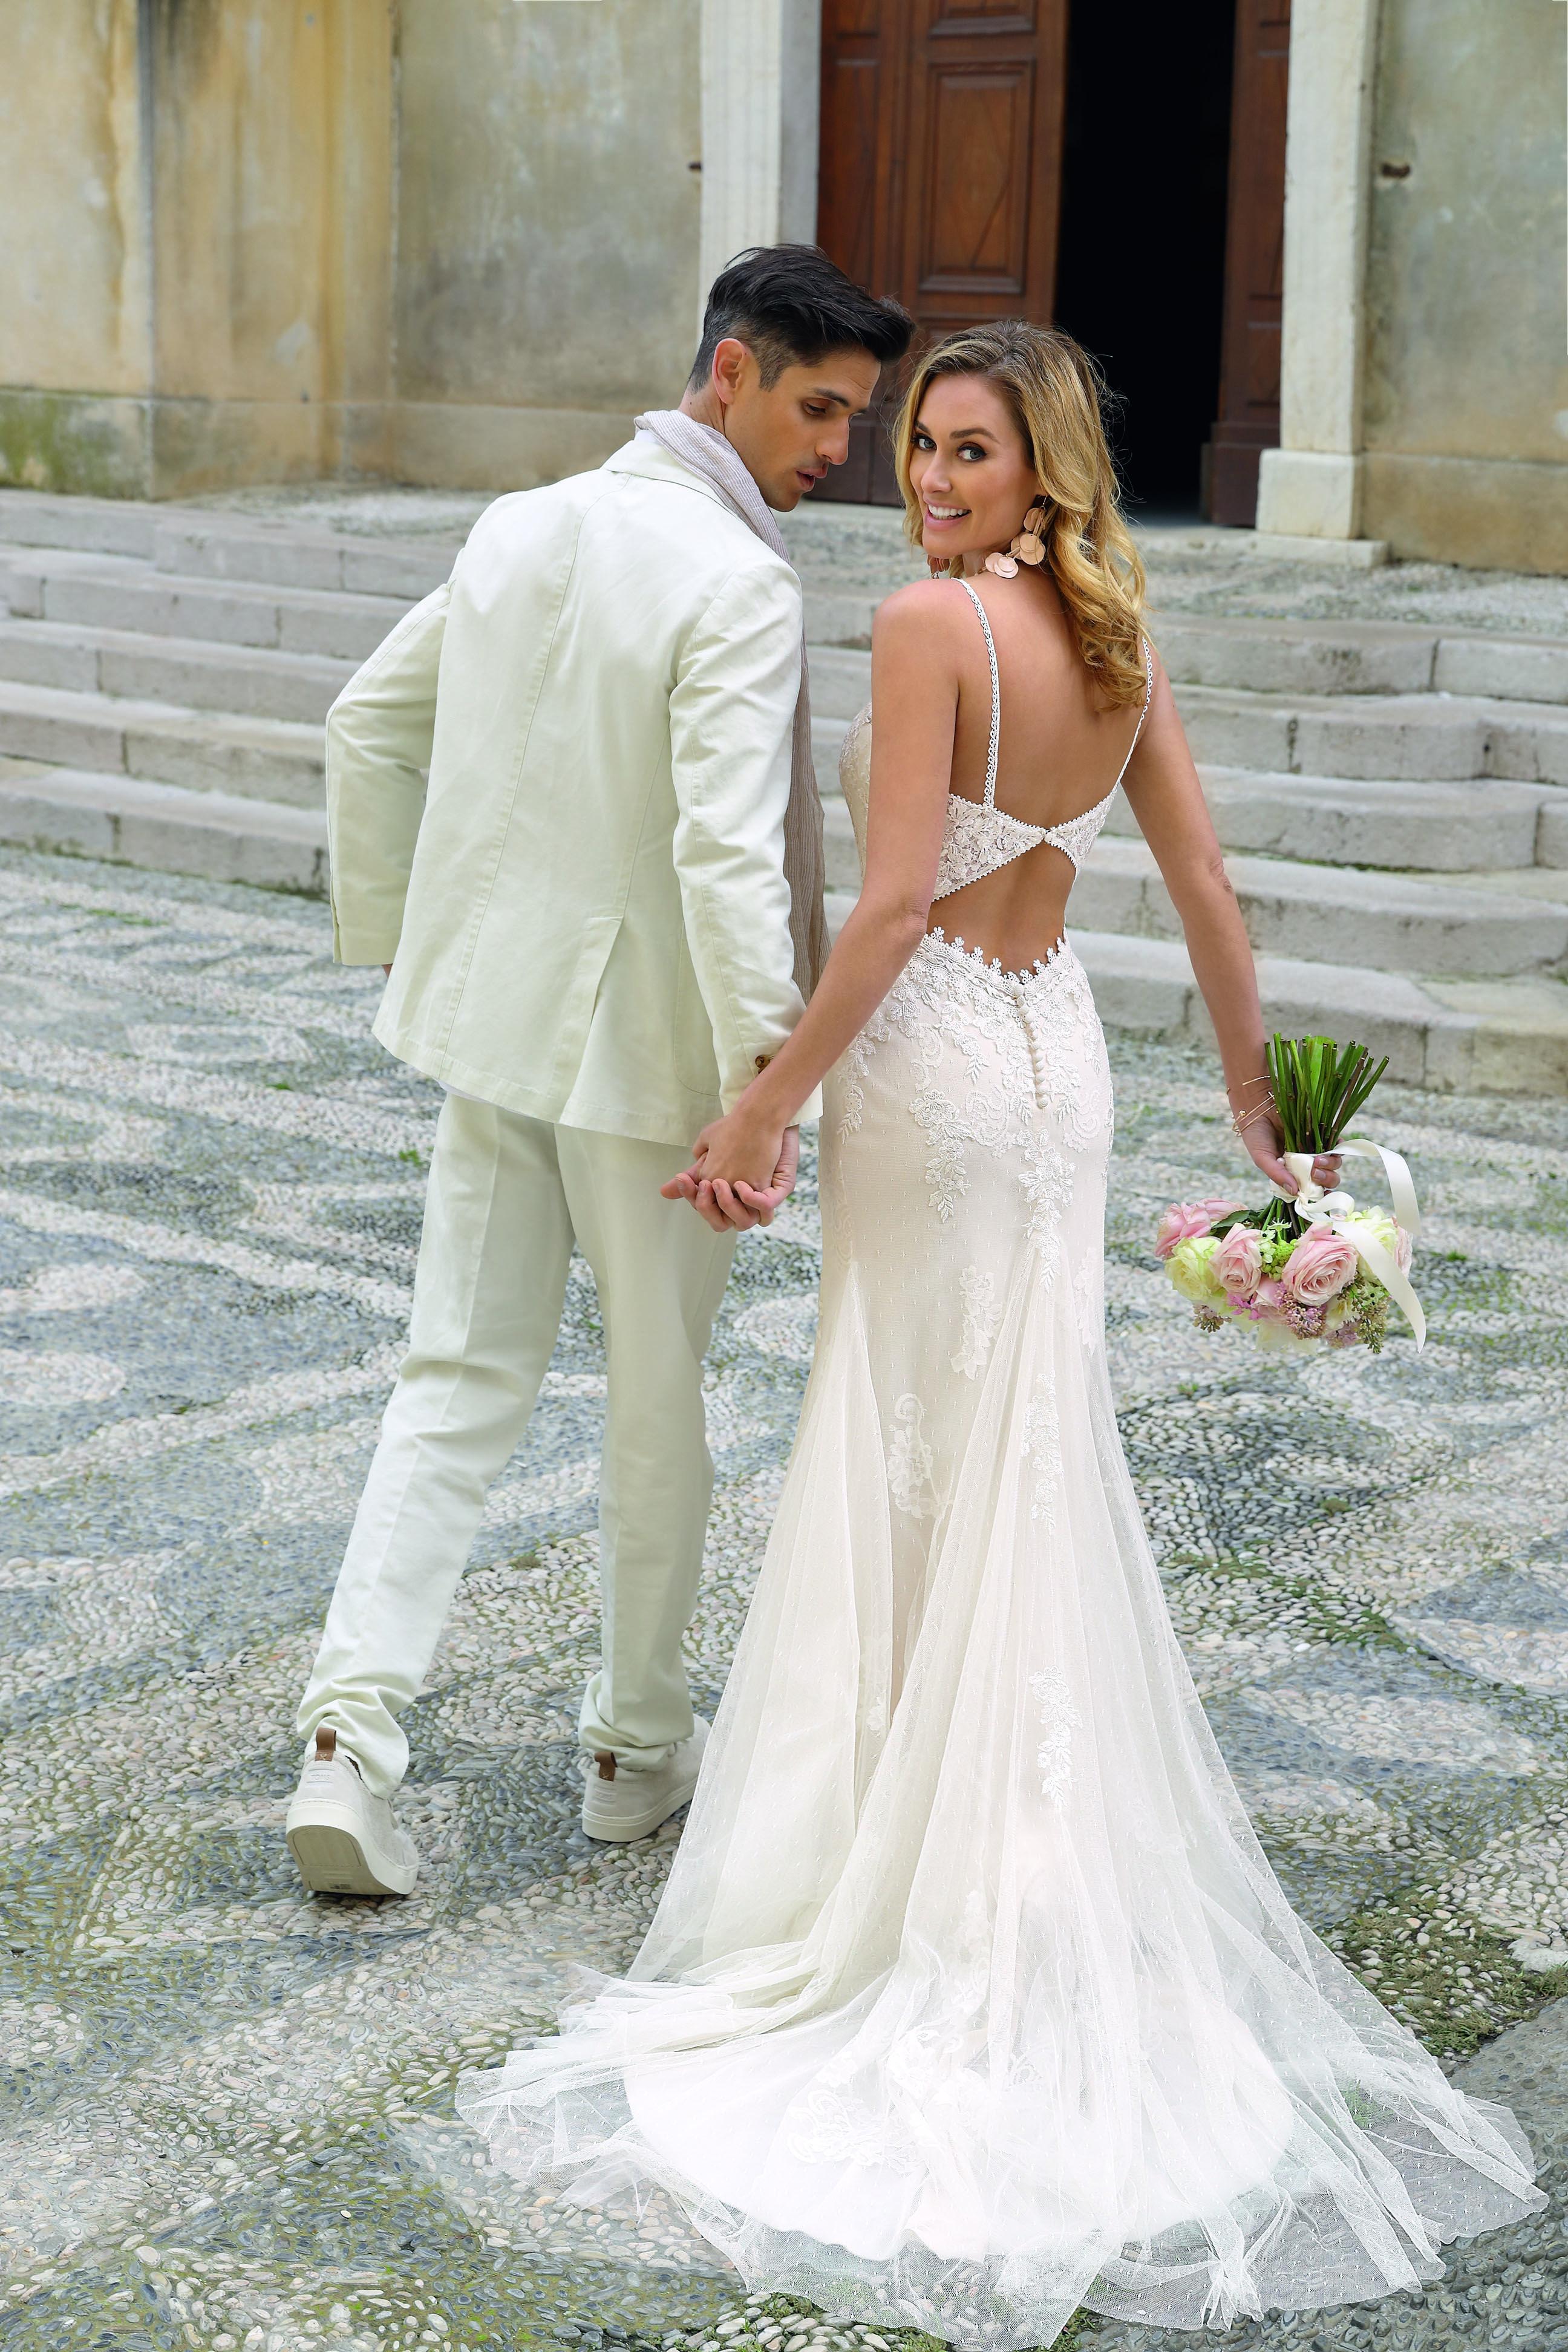 Ladybird 319056 Art 29106 Valkengoed Wedding Fashion